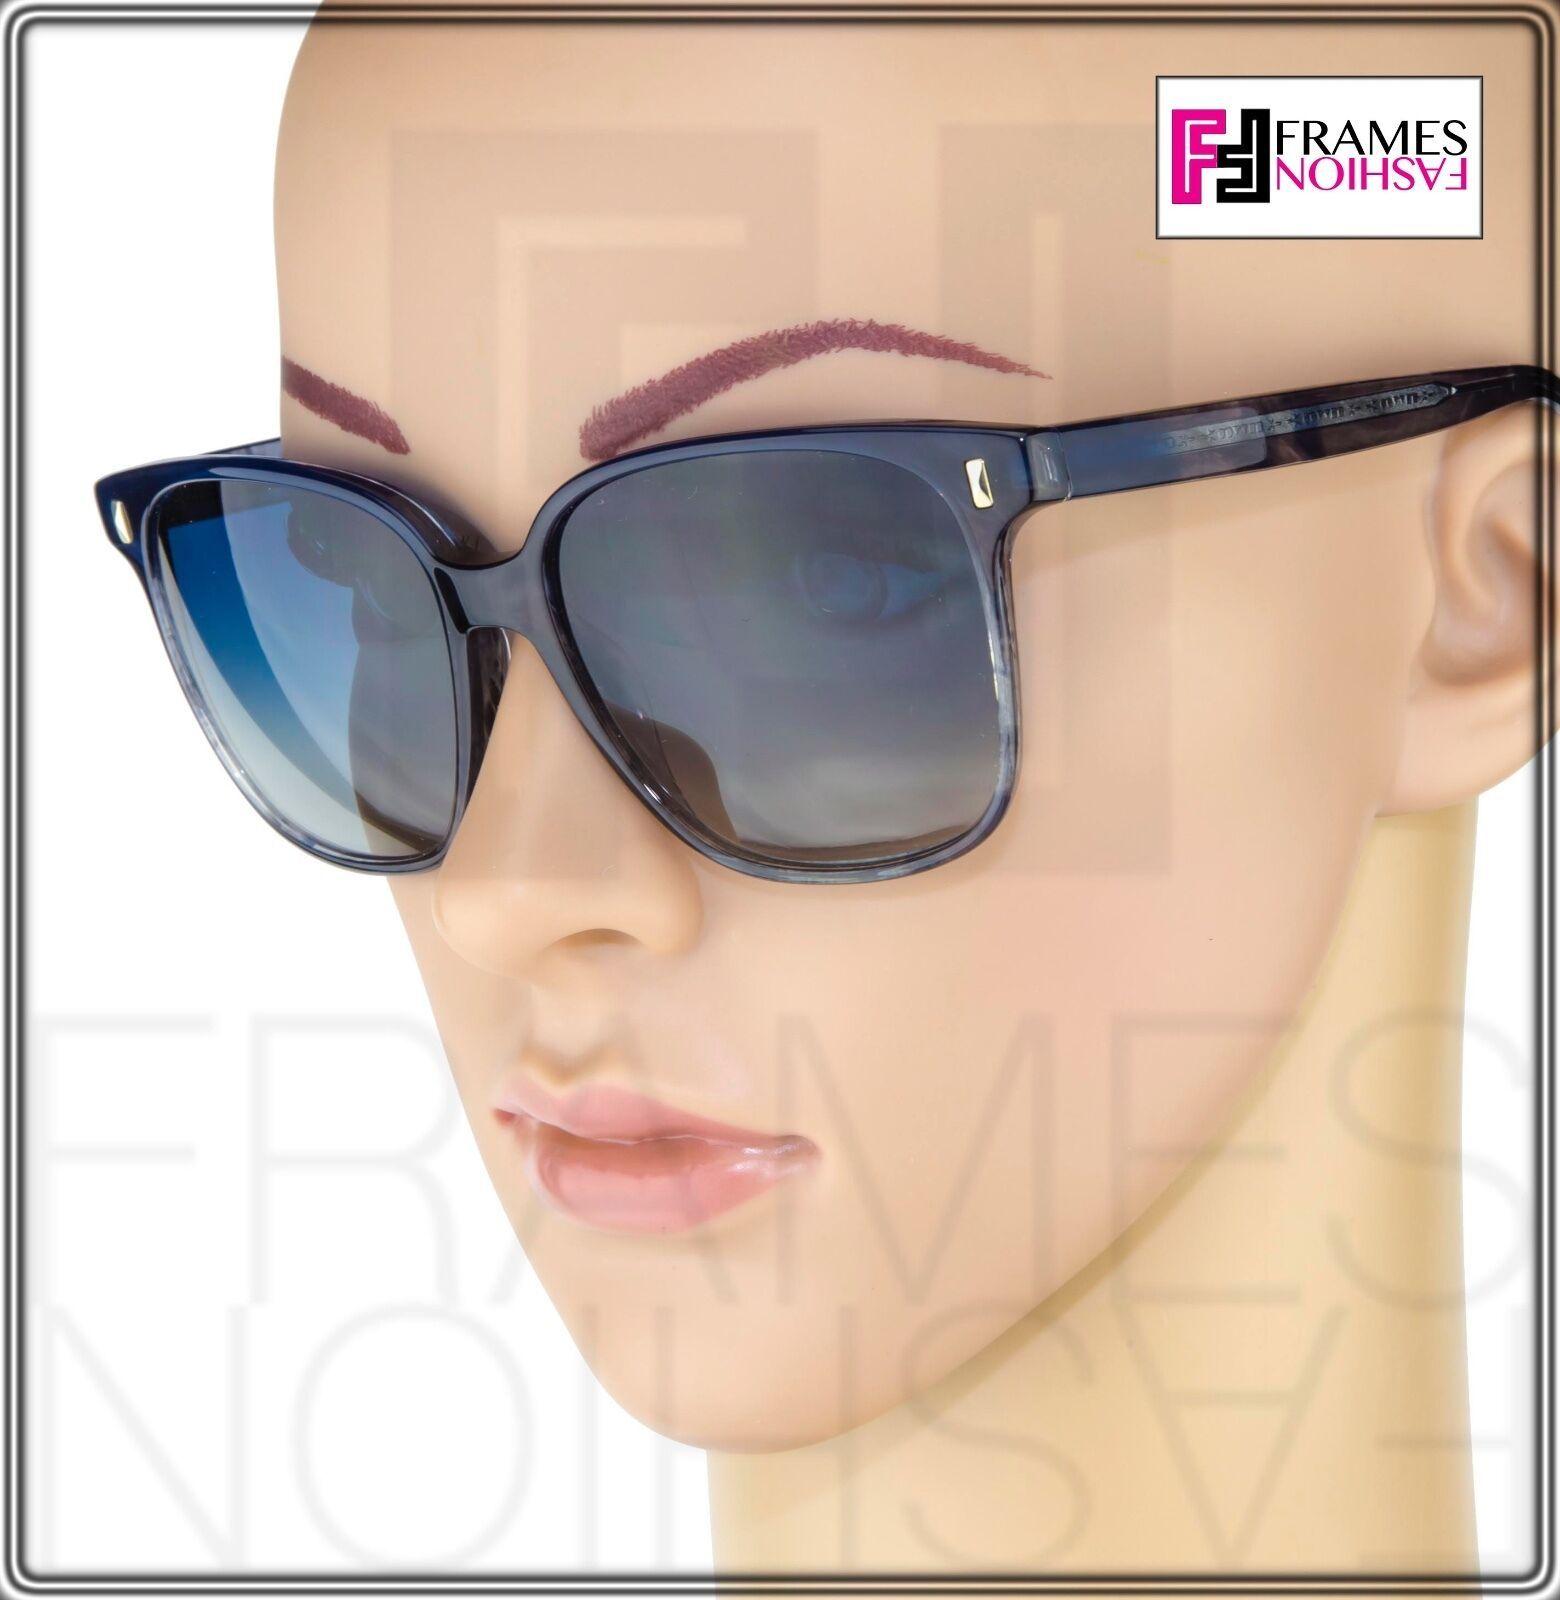 OLIVER PEOPLES MARMOT Square OV5266S Faded Sea Pacific Blue Sunglasses 5266 image 2